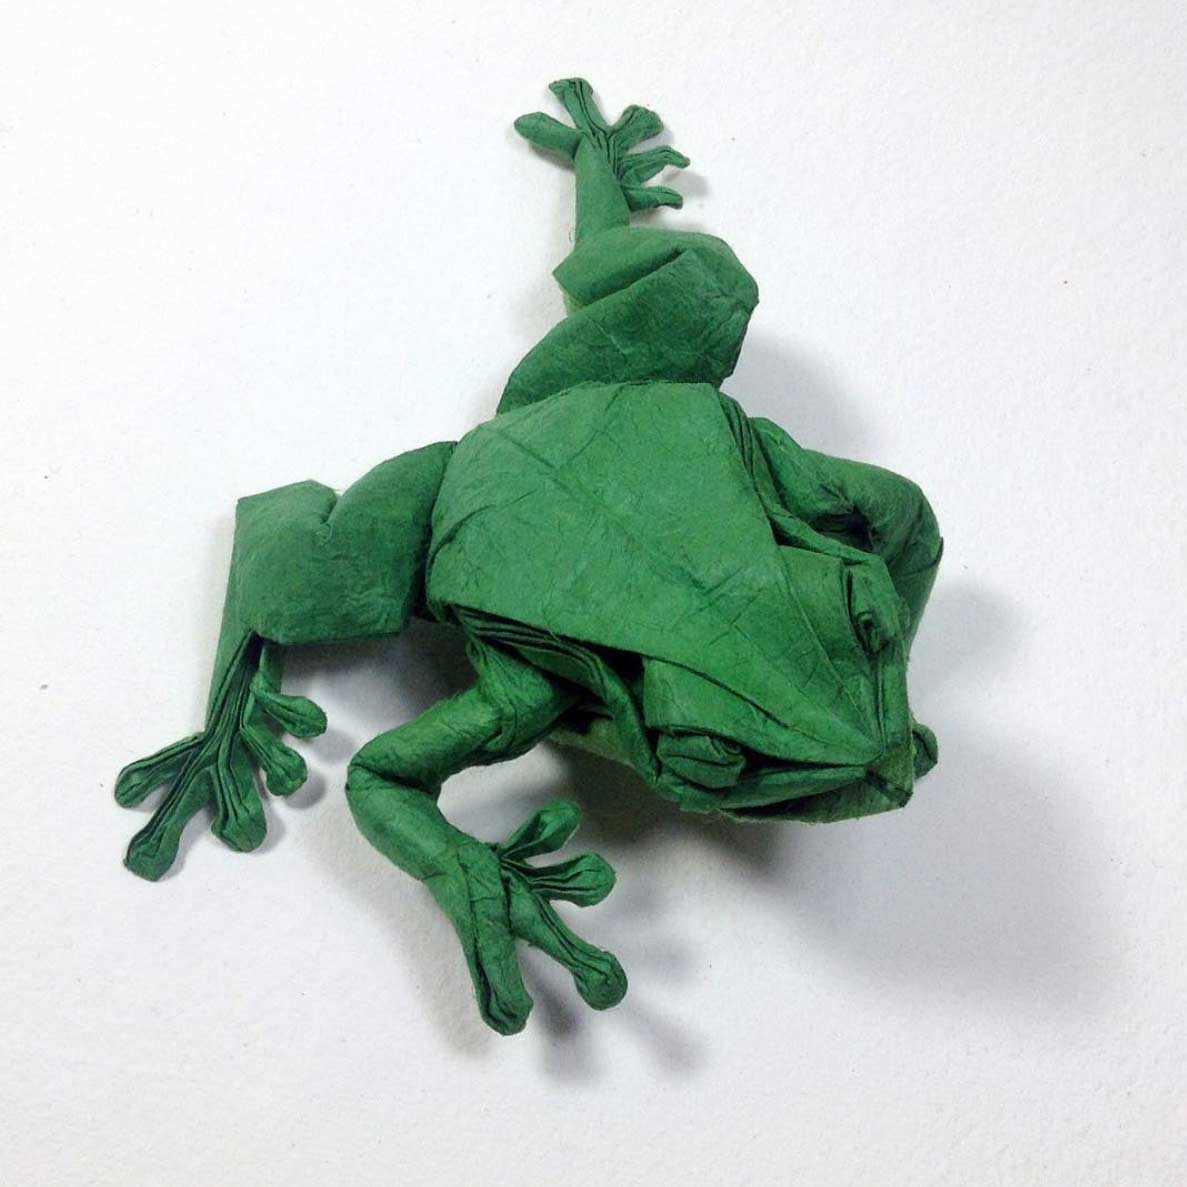 Geniale Origami-Kunstwerke von Robby Kraft Robby-Kraft-Origami_06